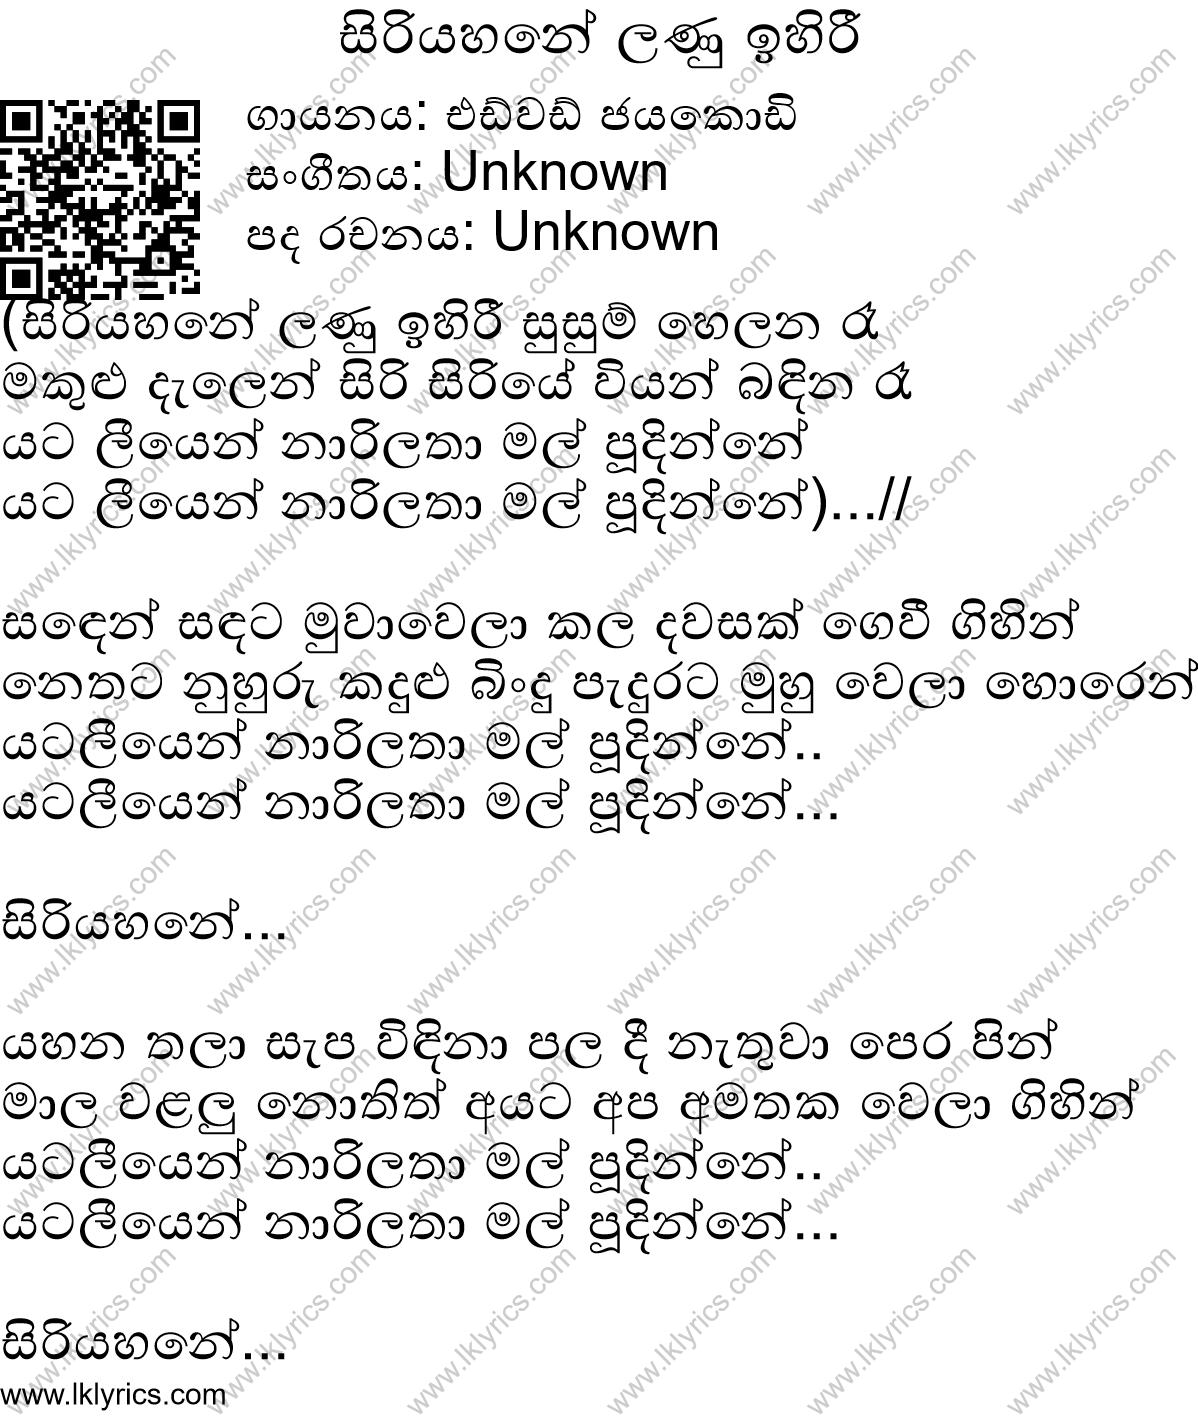 Digital Millennium Copyright Act Notice: Siriyahane Lanu Ihiri Lyrics